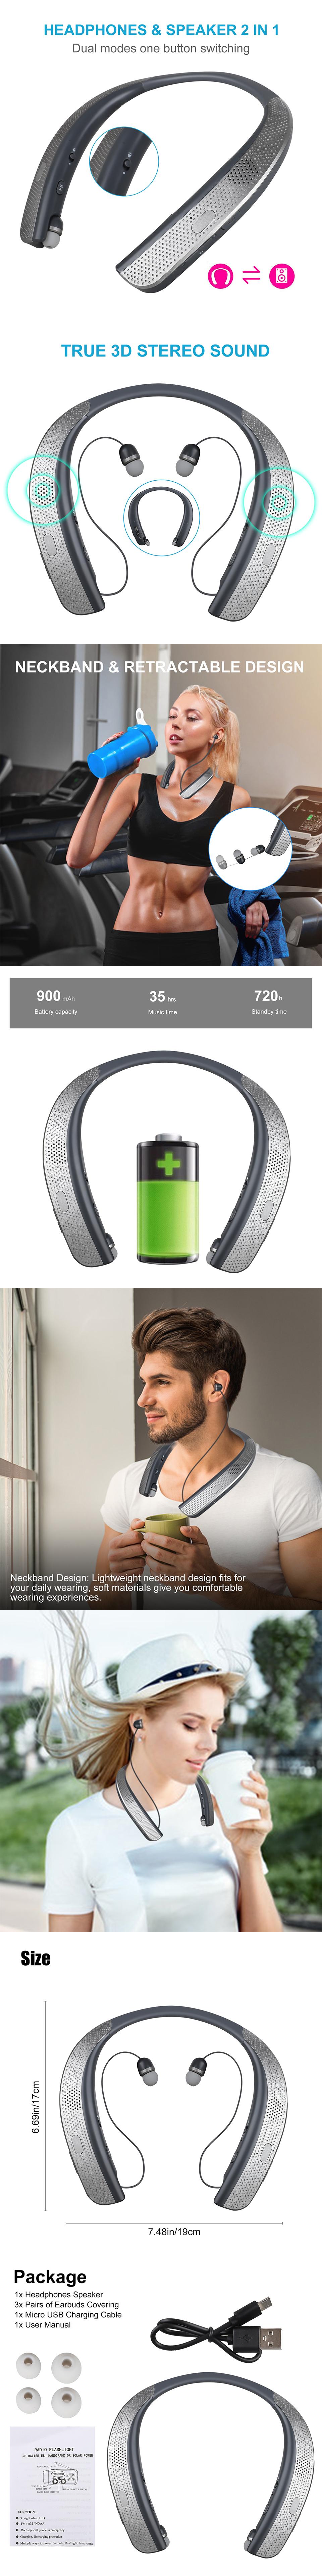 Bluetooth Neckband True 3D Stereo Headphones Headset Earbuds Speaker Earphone US